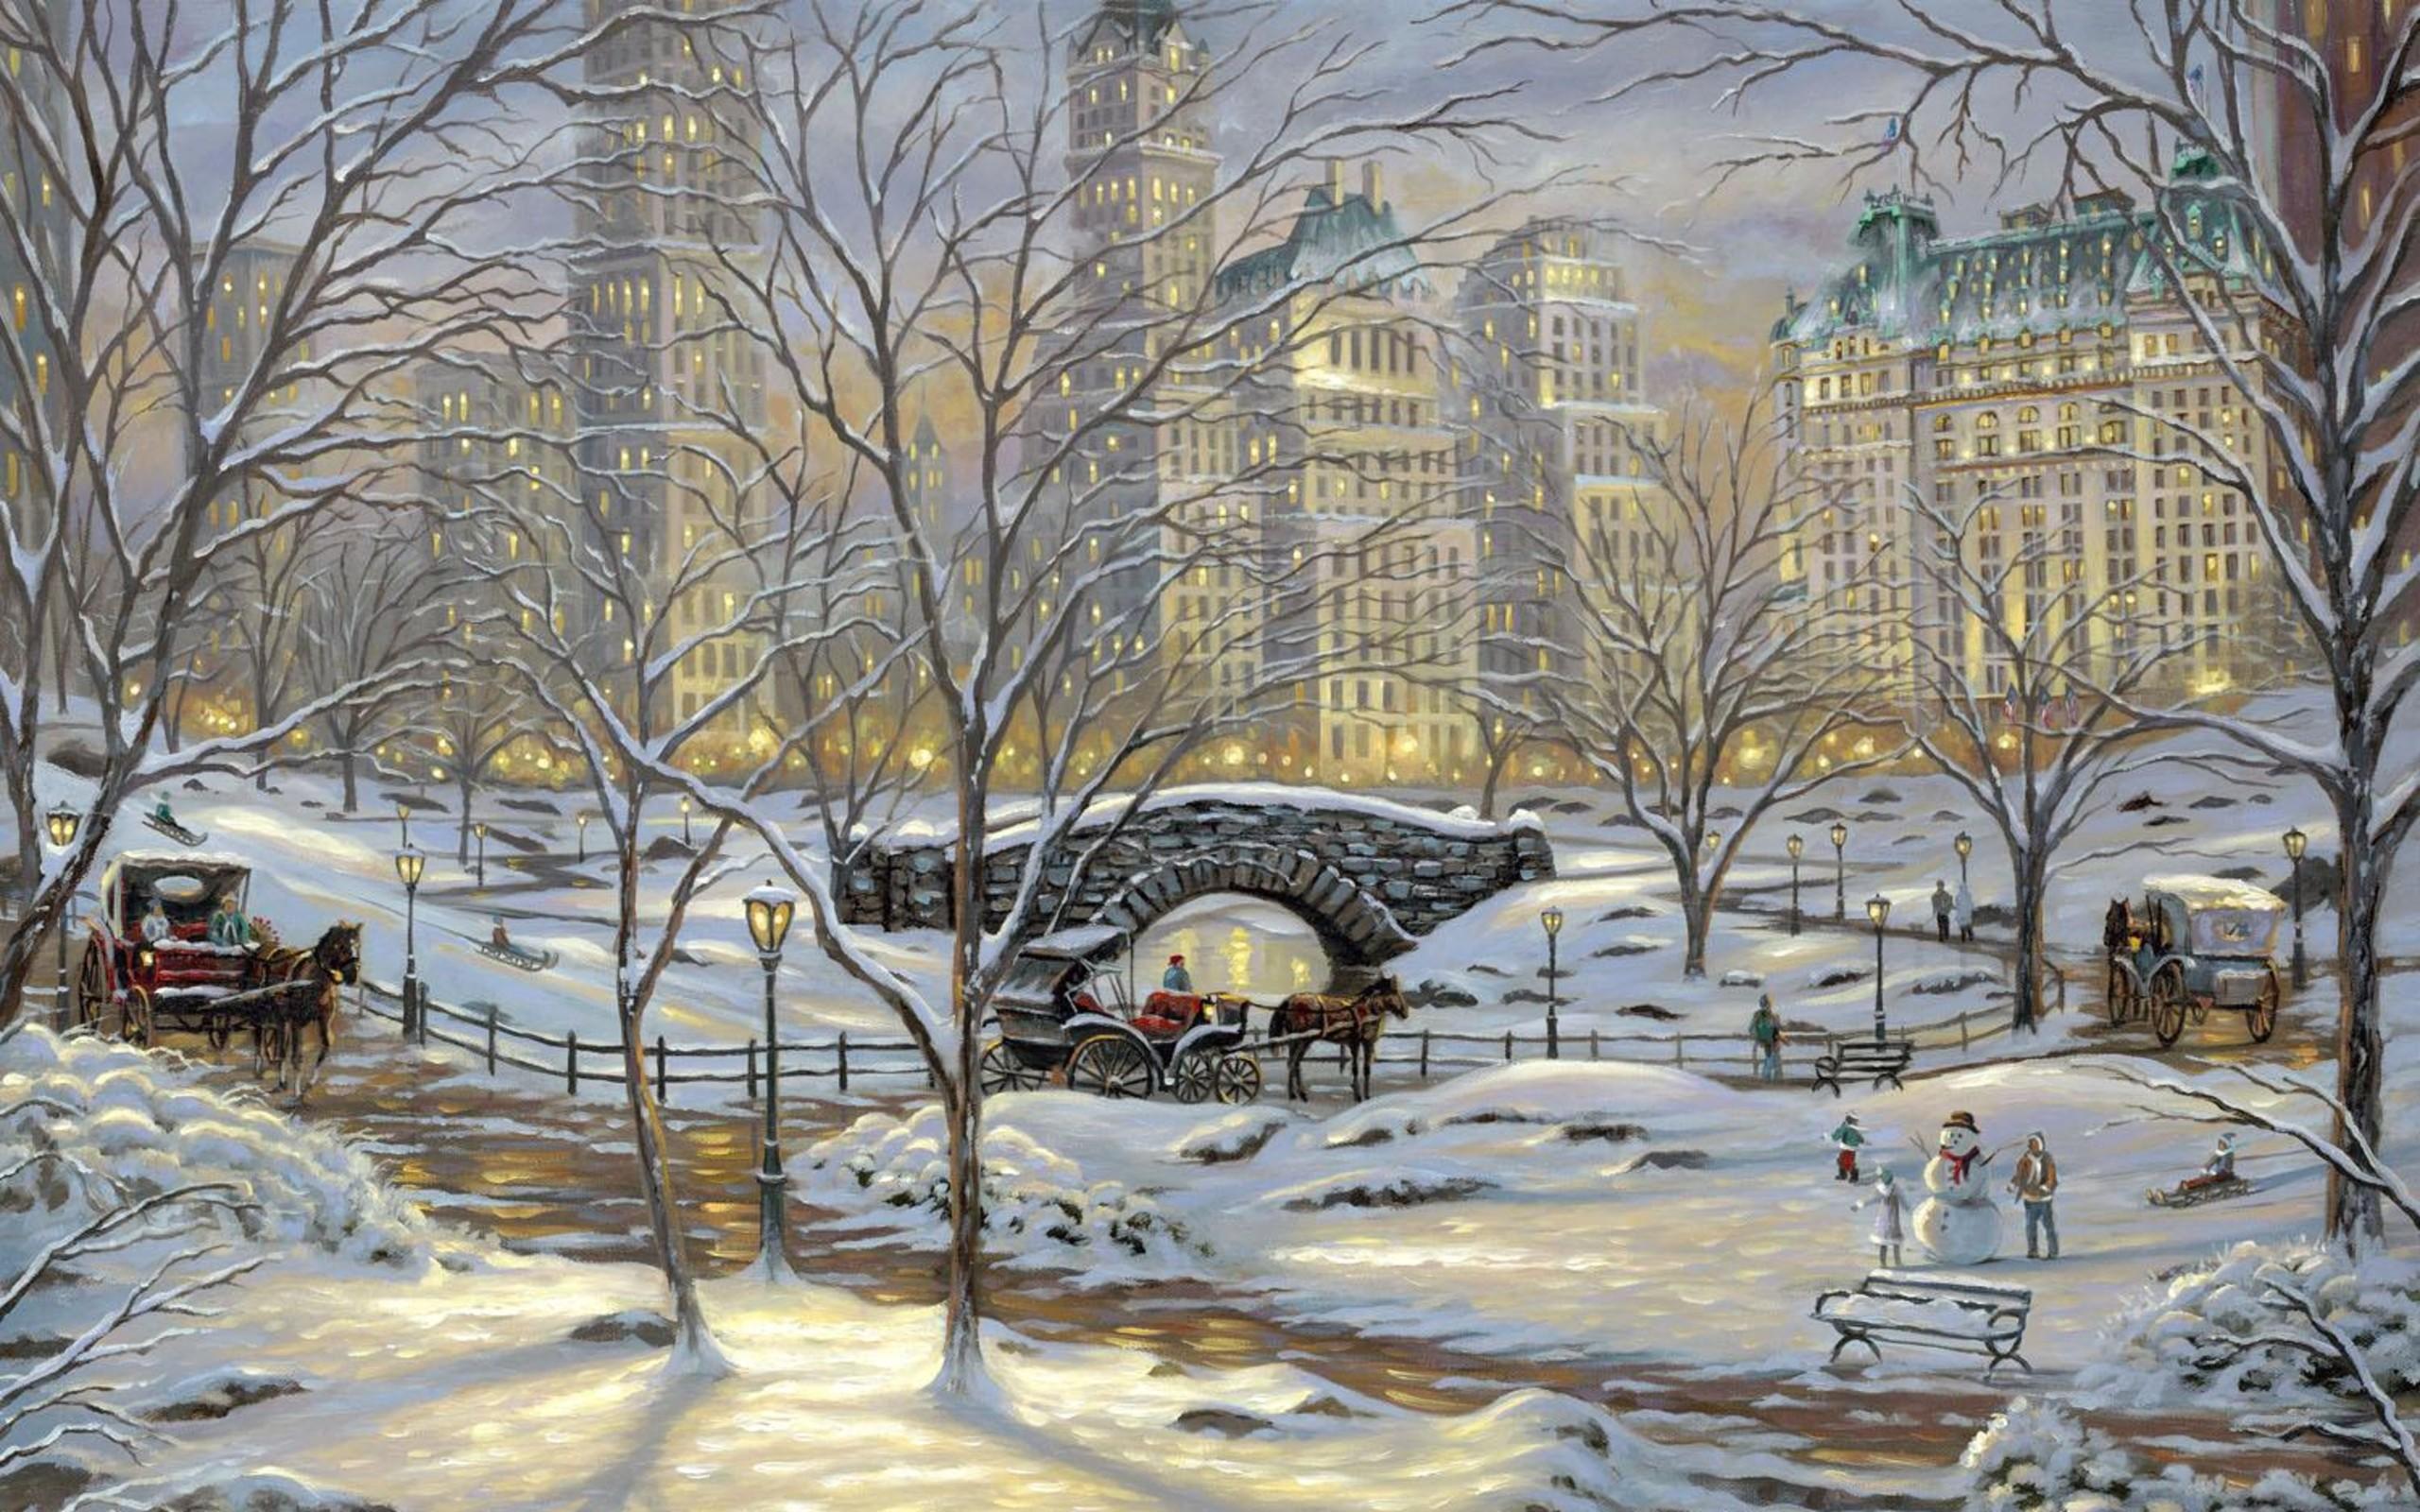 New york city winter wallpaper 62 images for Foto inverno per desktop